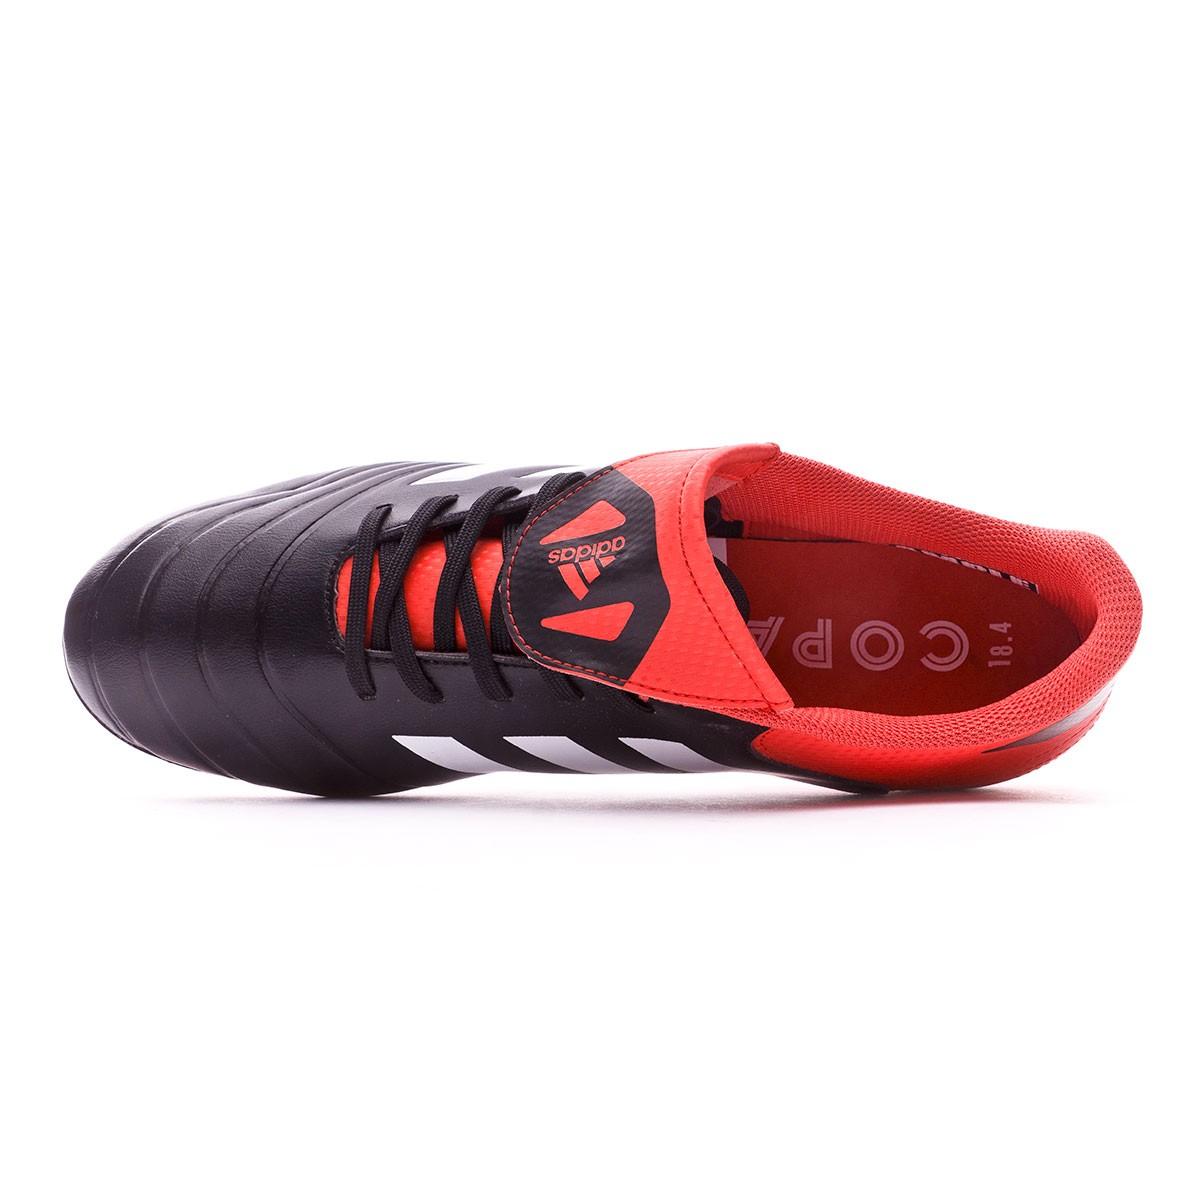 super popular 1a4ac 9e1b6 Zapatos de fútbol adidas Copa 18.4 FxG Core black-White-Real coral - Tienda  de fútbol Fútbol Emotion